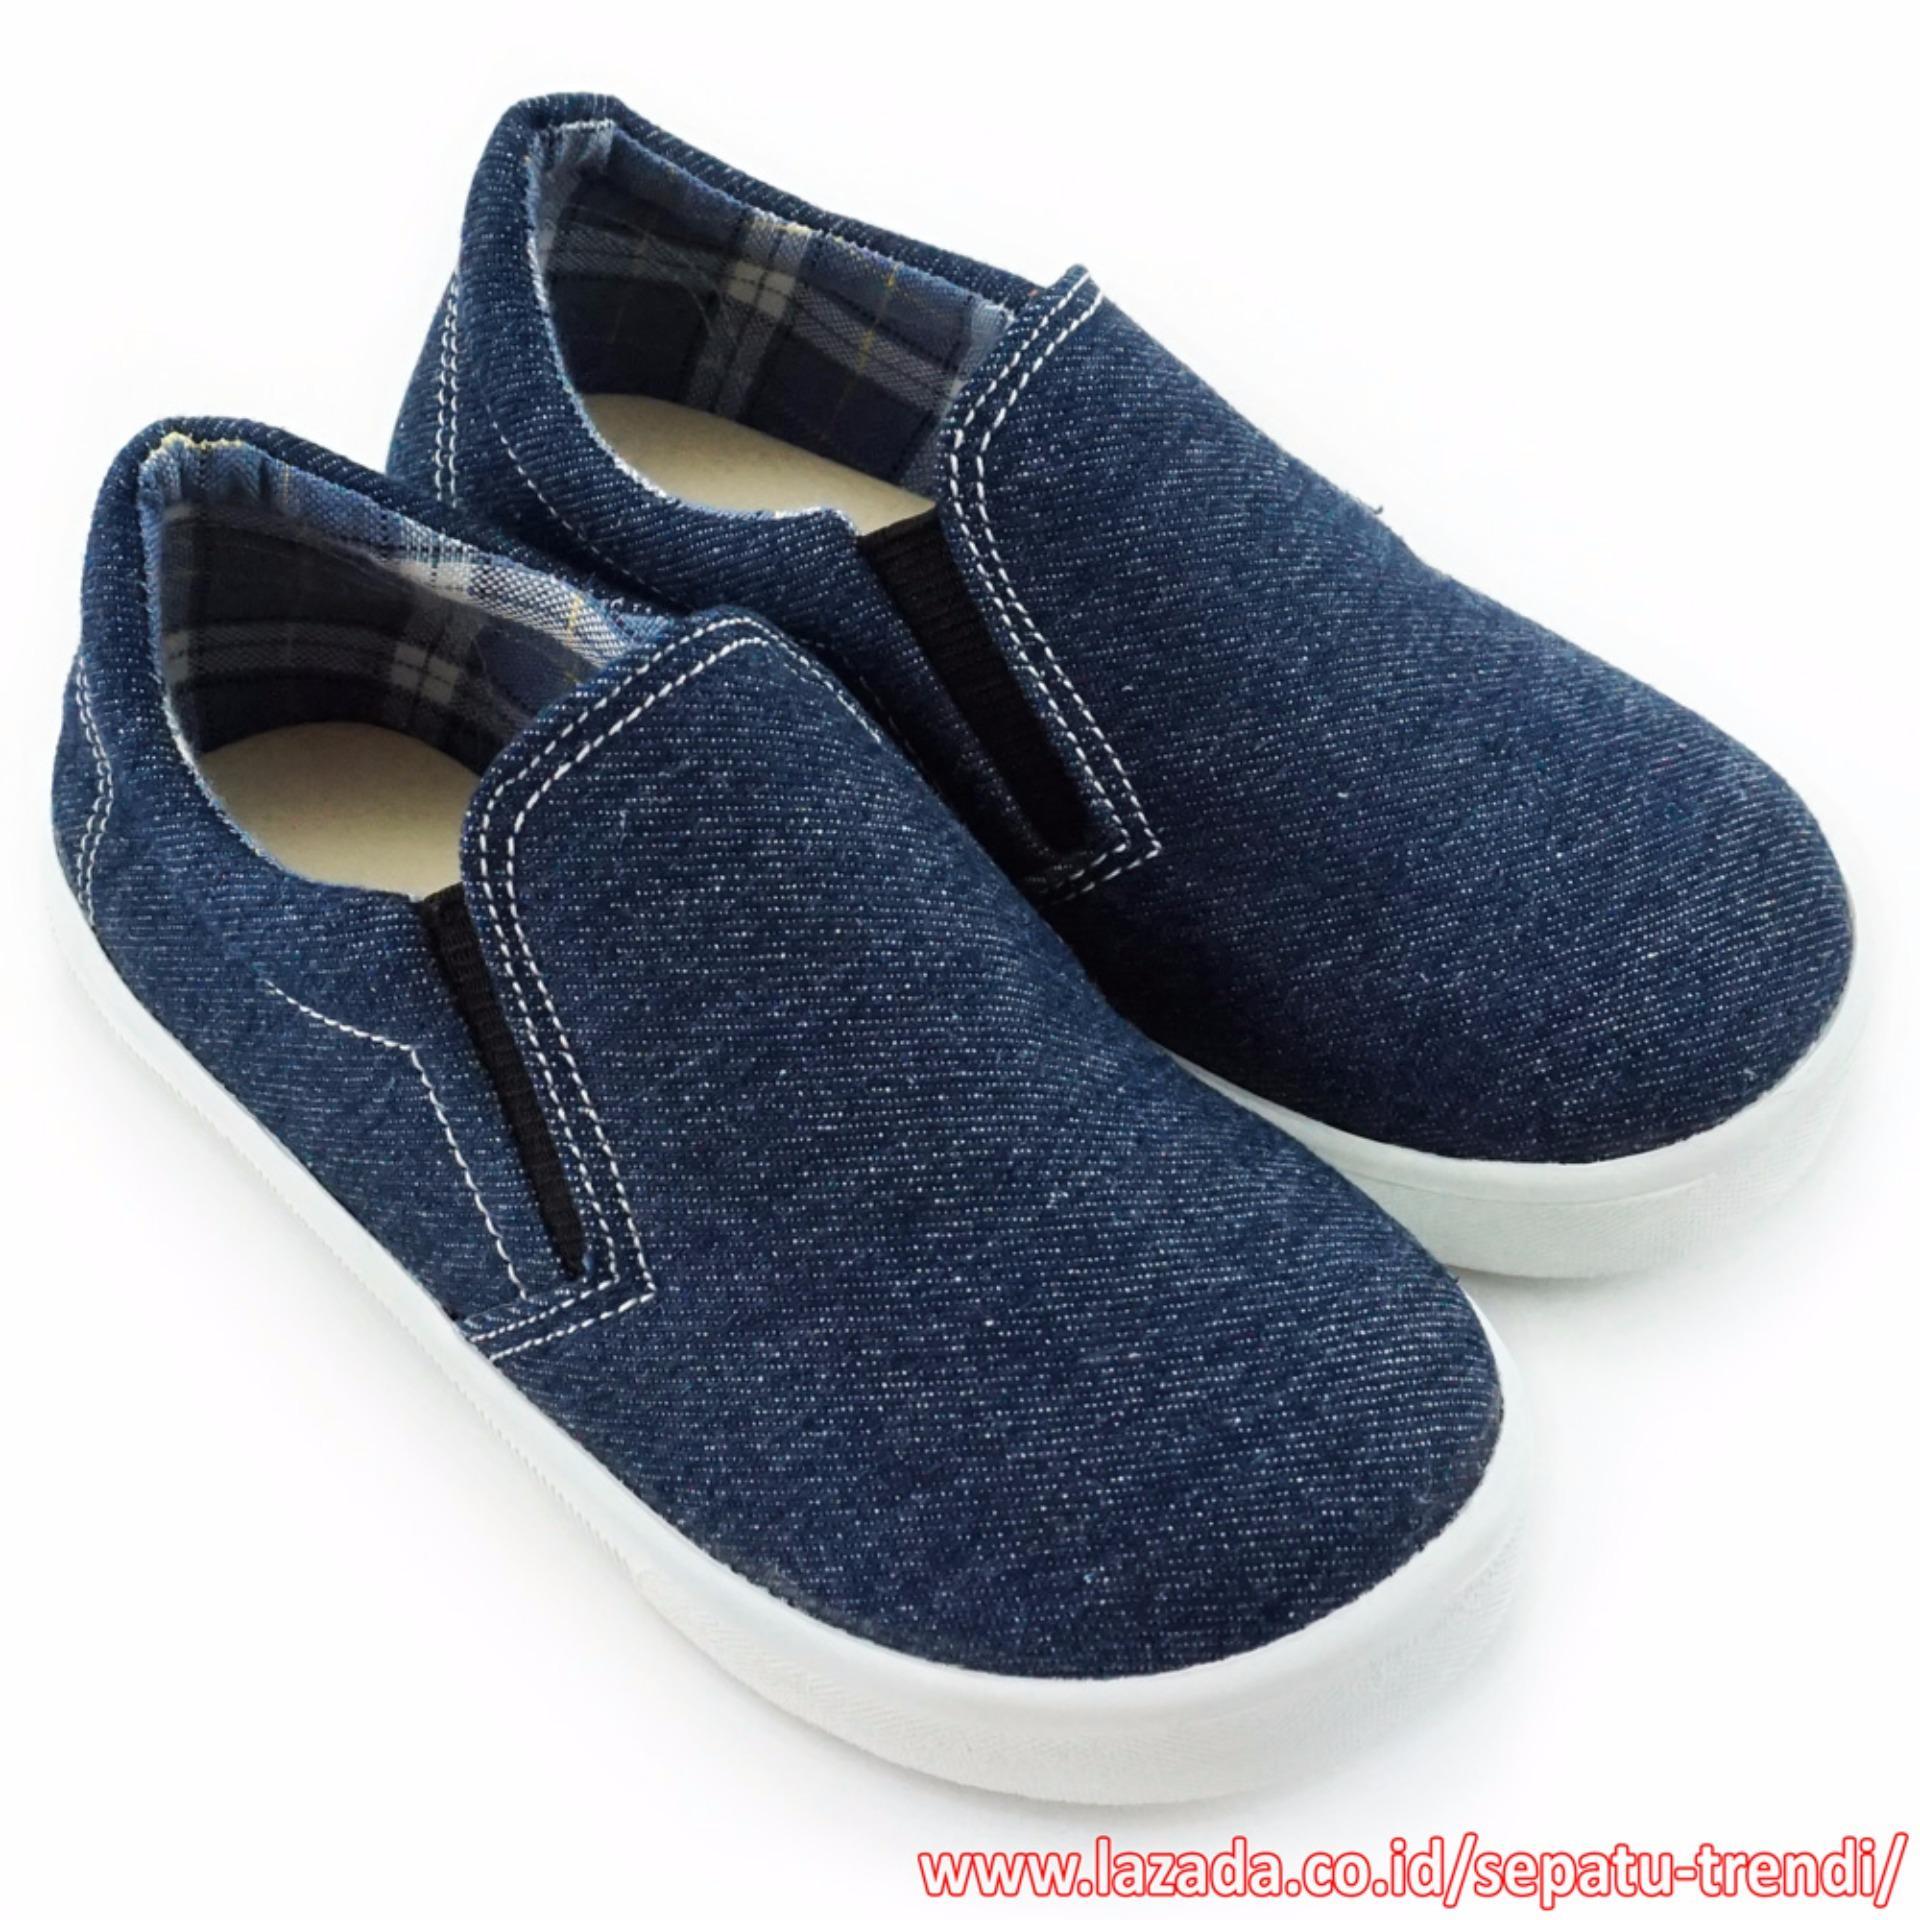 Harga Trendishoes Sepatu Anak Laki Slip On Denim Elegan 01Slag Navy Trendishoes Online